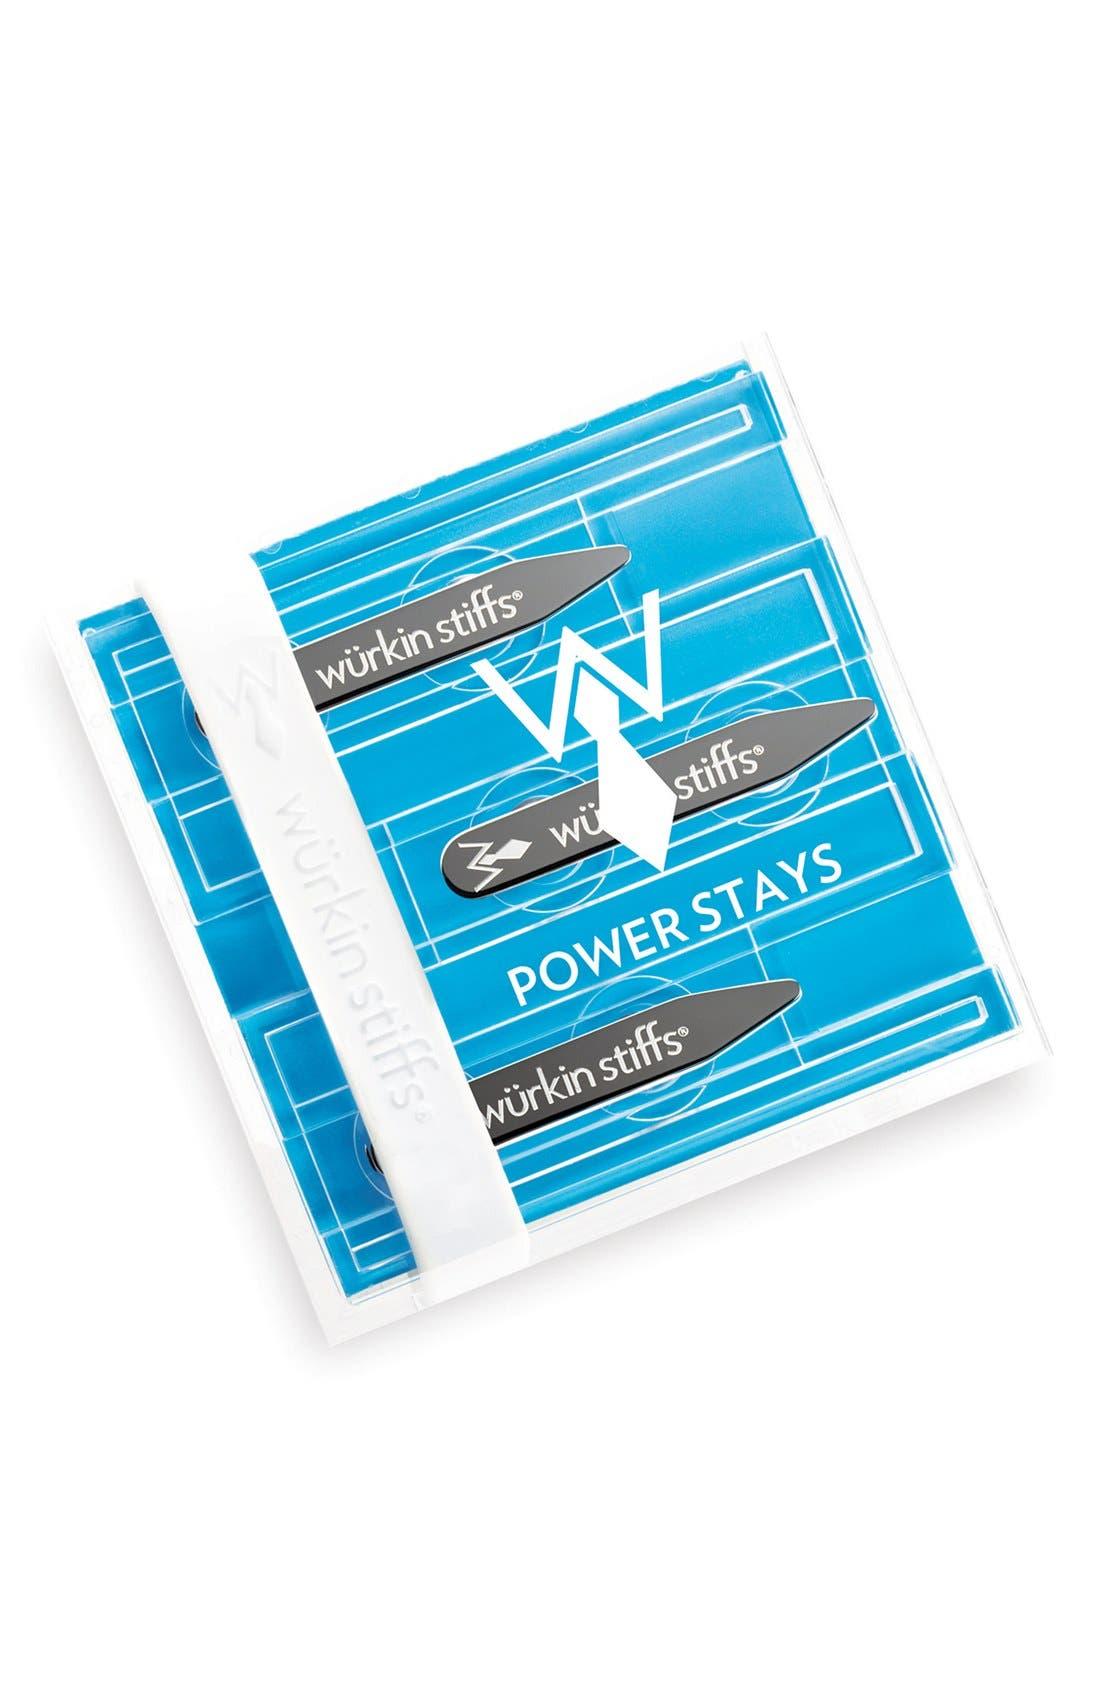 Würkin Stiffs 'Power Stays' Collar Stays (Set of 3)